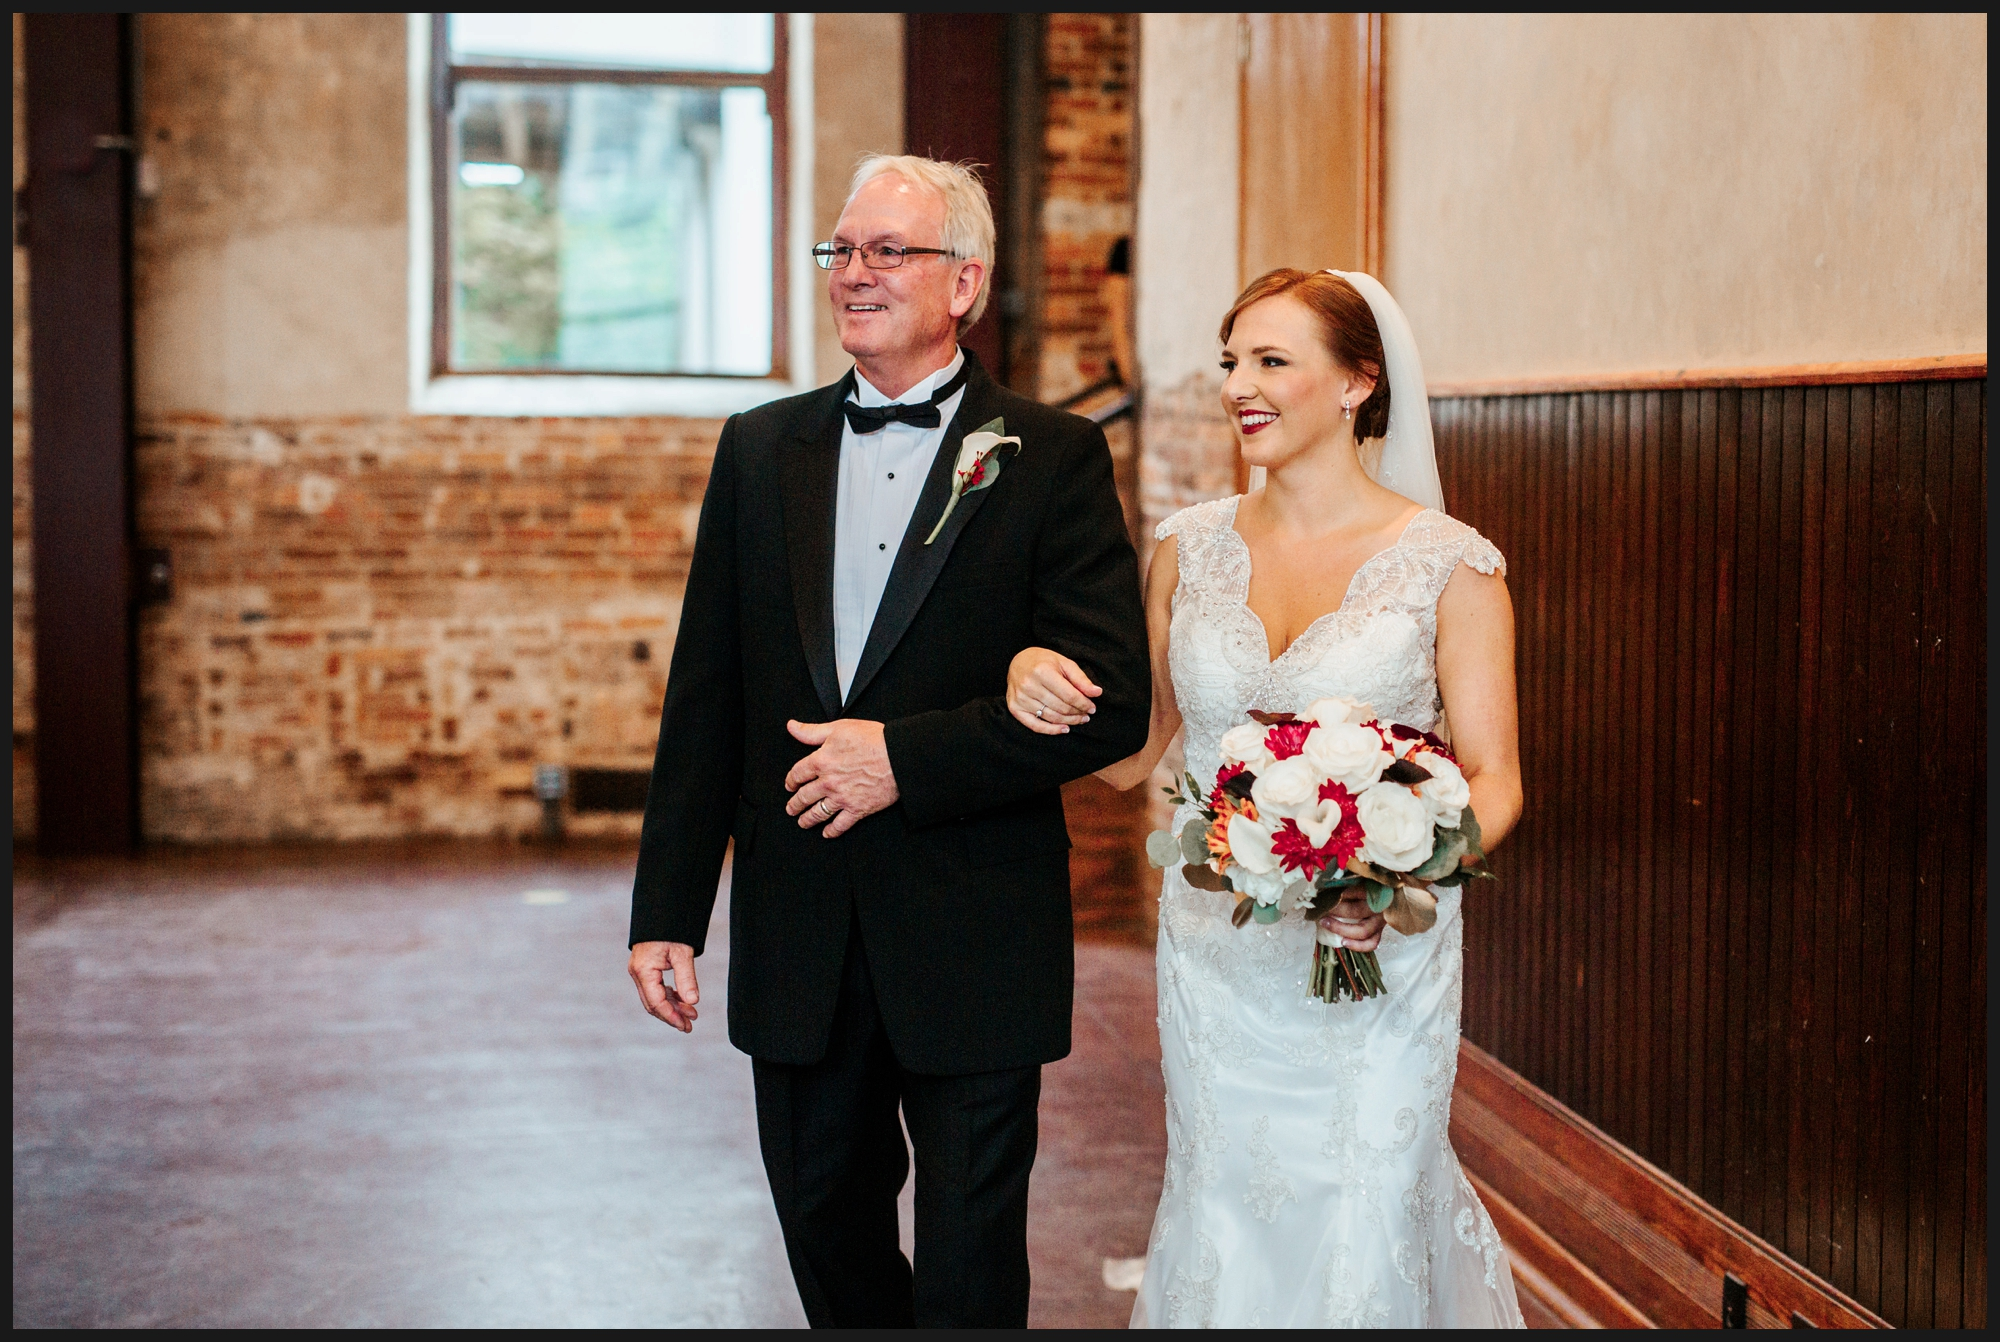 Orlando-Wedding-Photographer-destination-wedding-photographer-florida-wedding-photographer-bohemian-wedding-photographer_0620.jpg